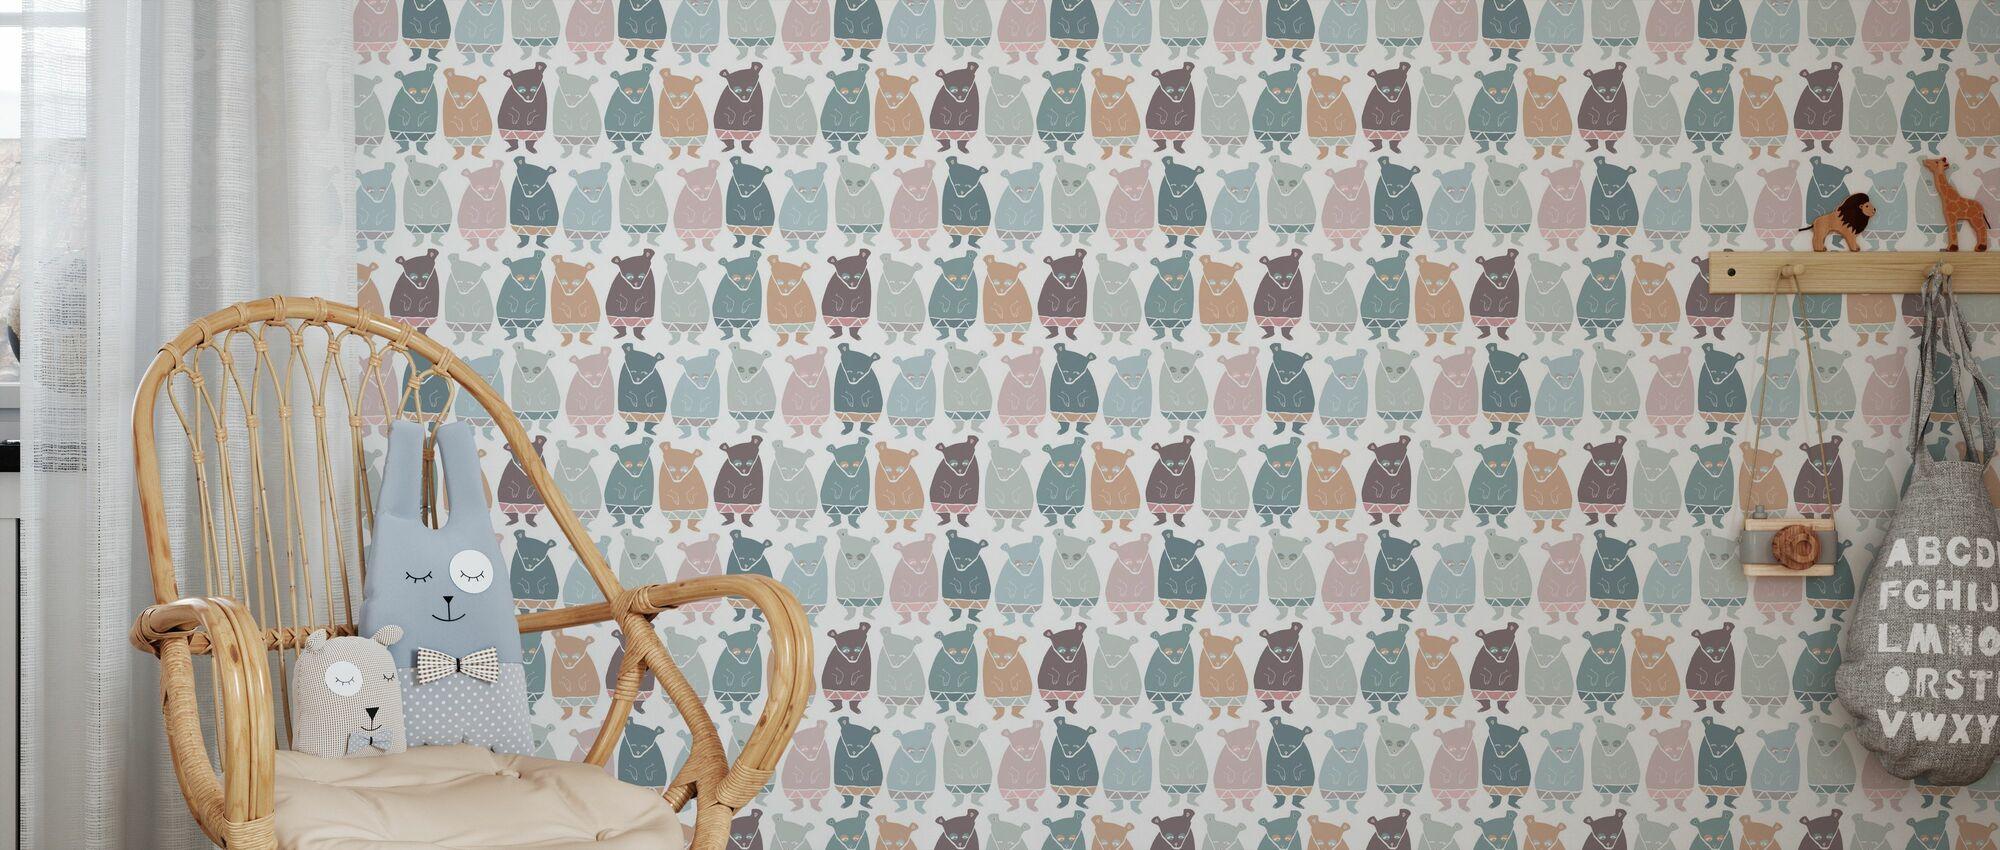 Bear Grills Soft - Wallpaper - Kids Room